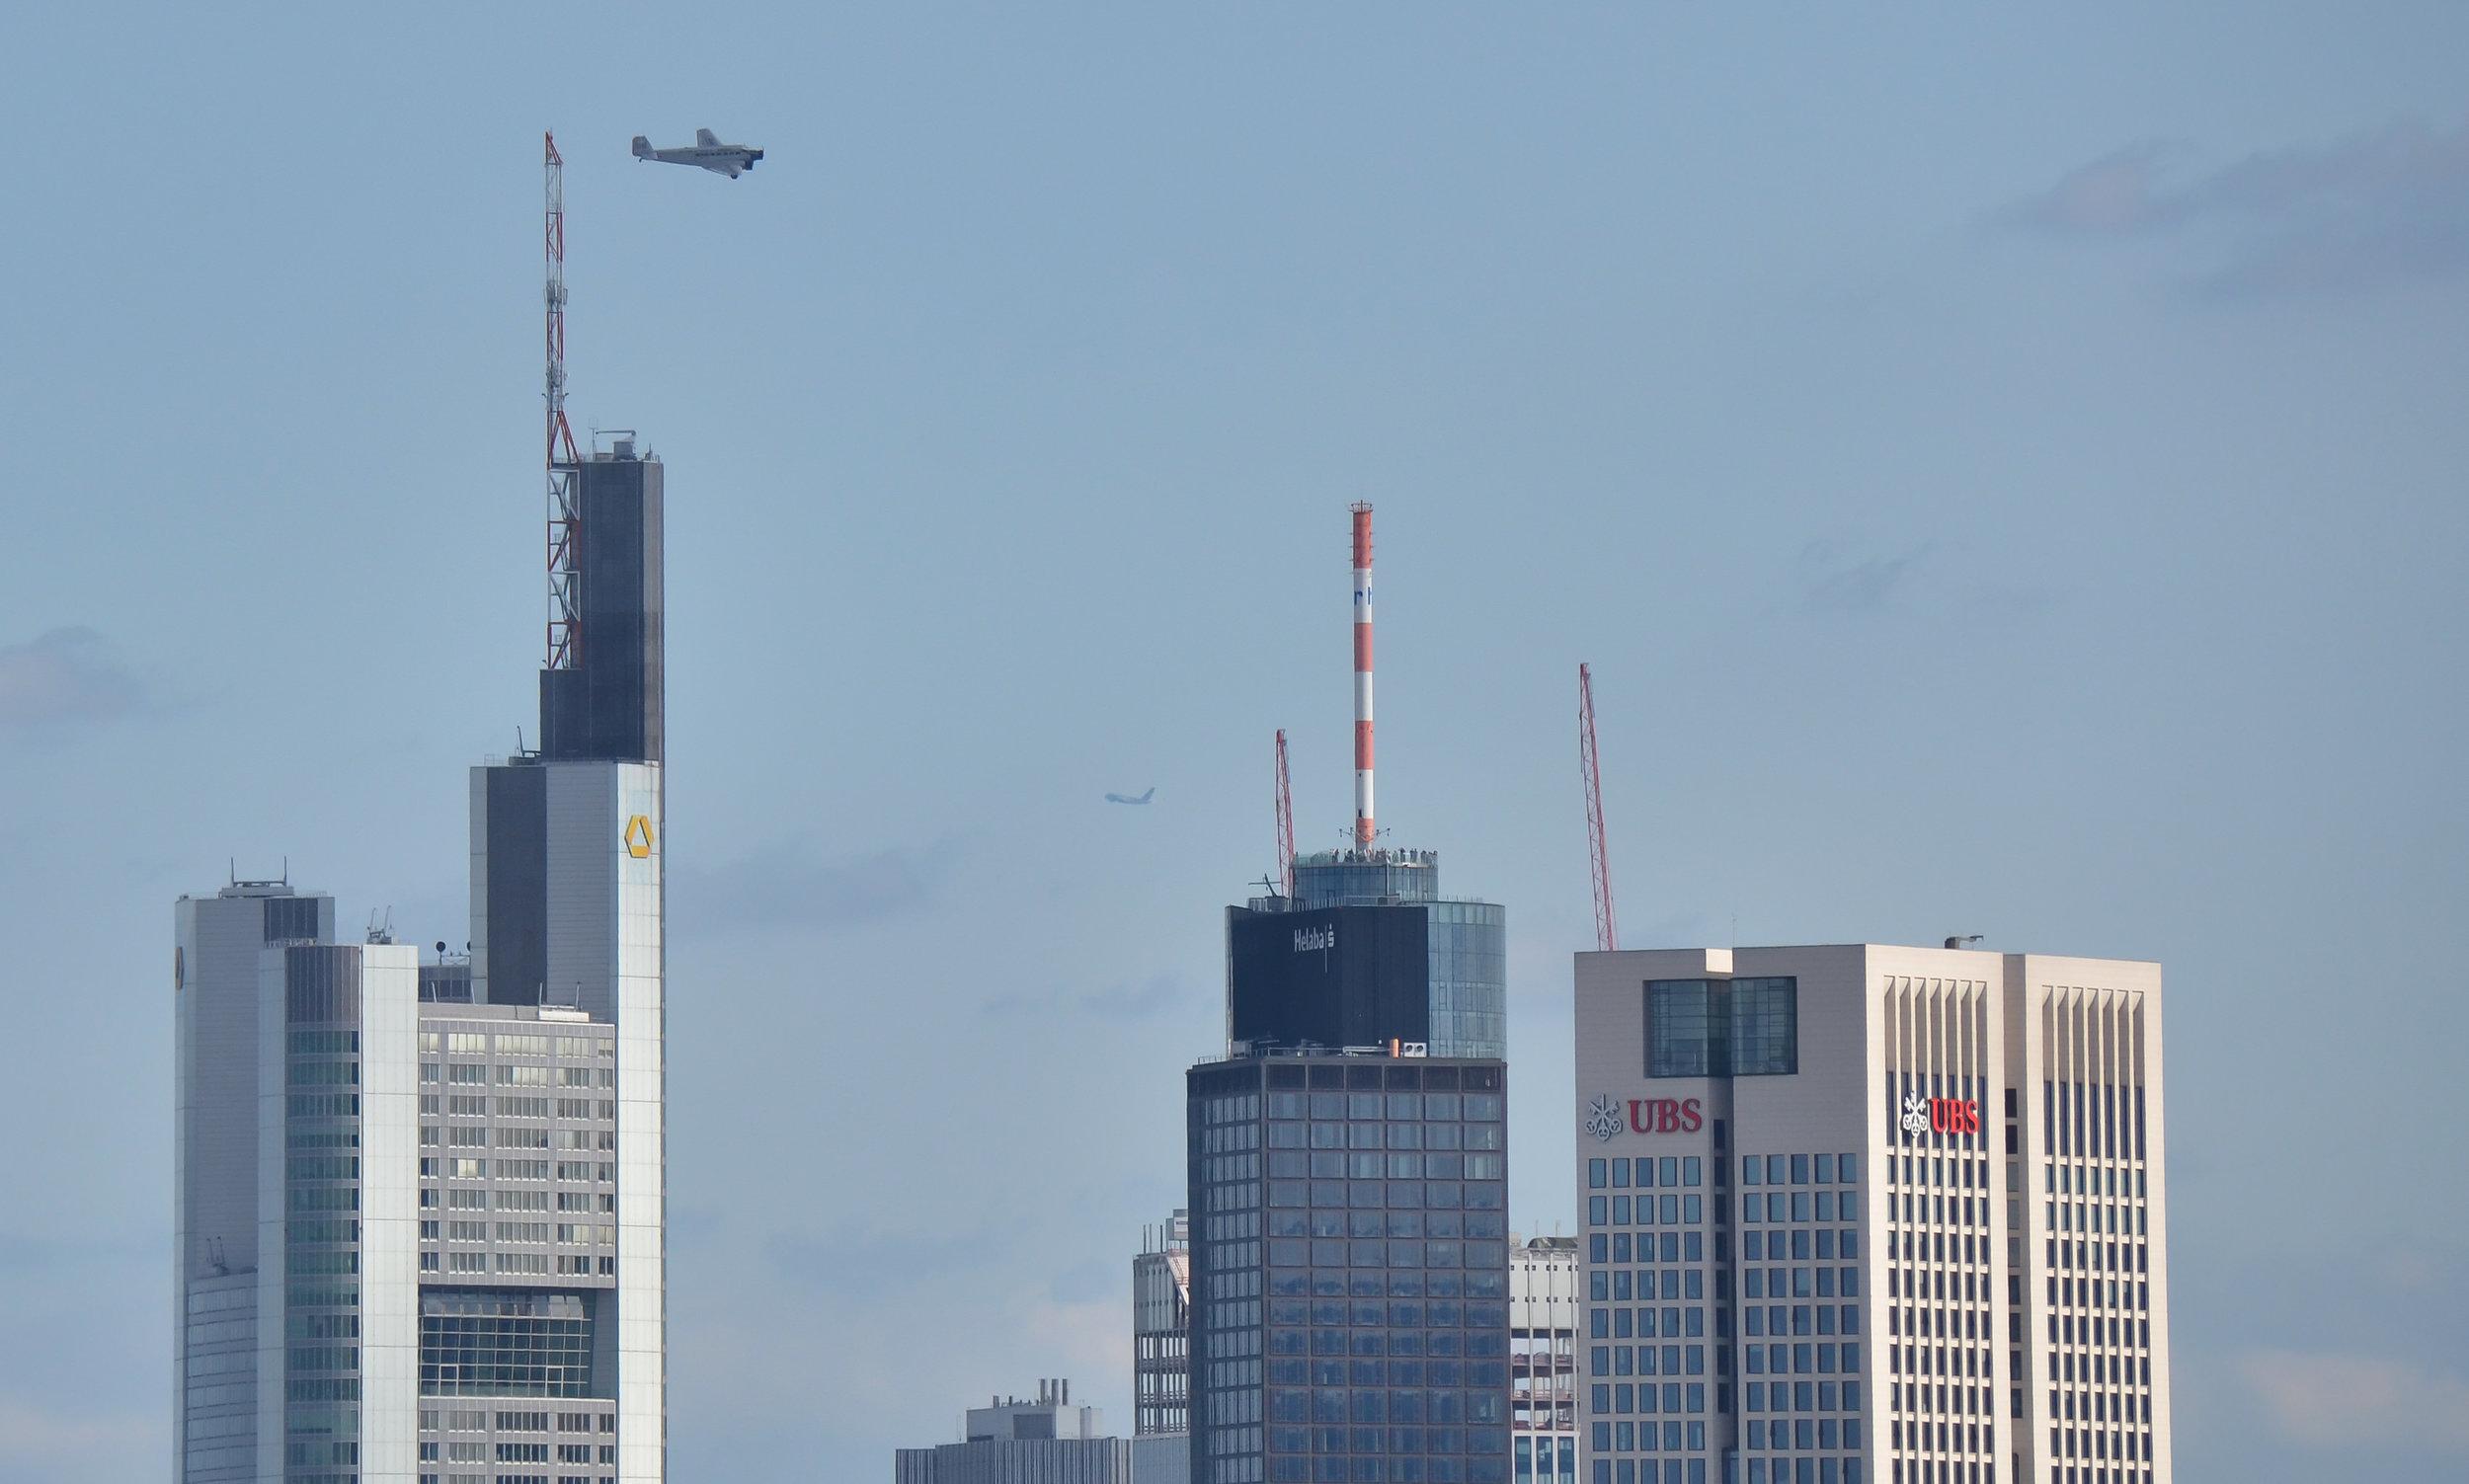 Junkers JU 52 über Frankfurt im Jahre 2013. ©Michael Kleinespel